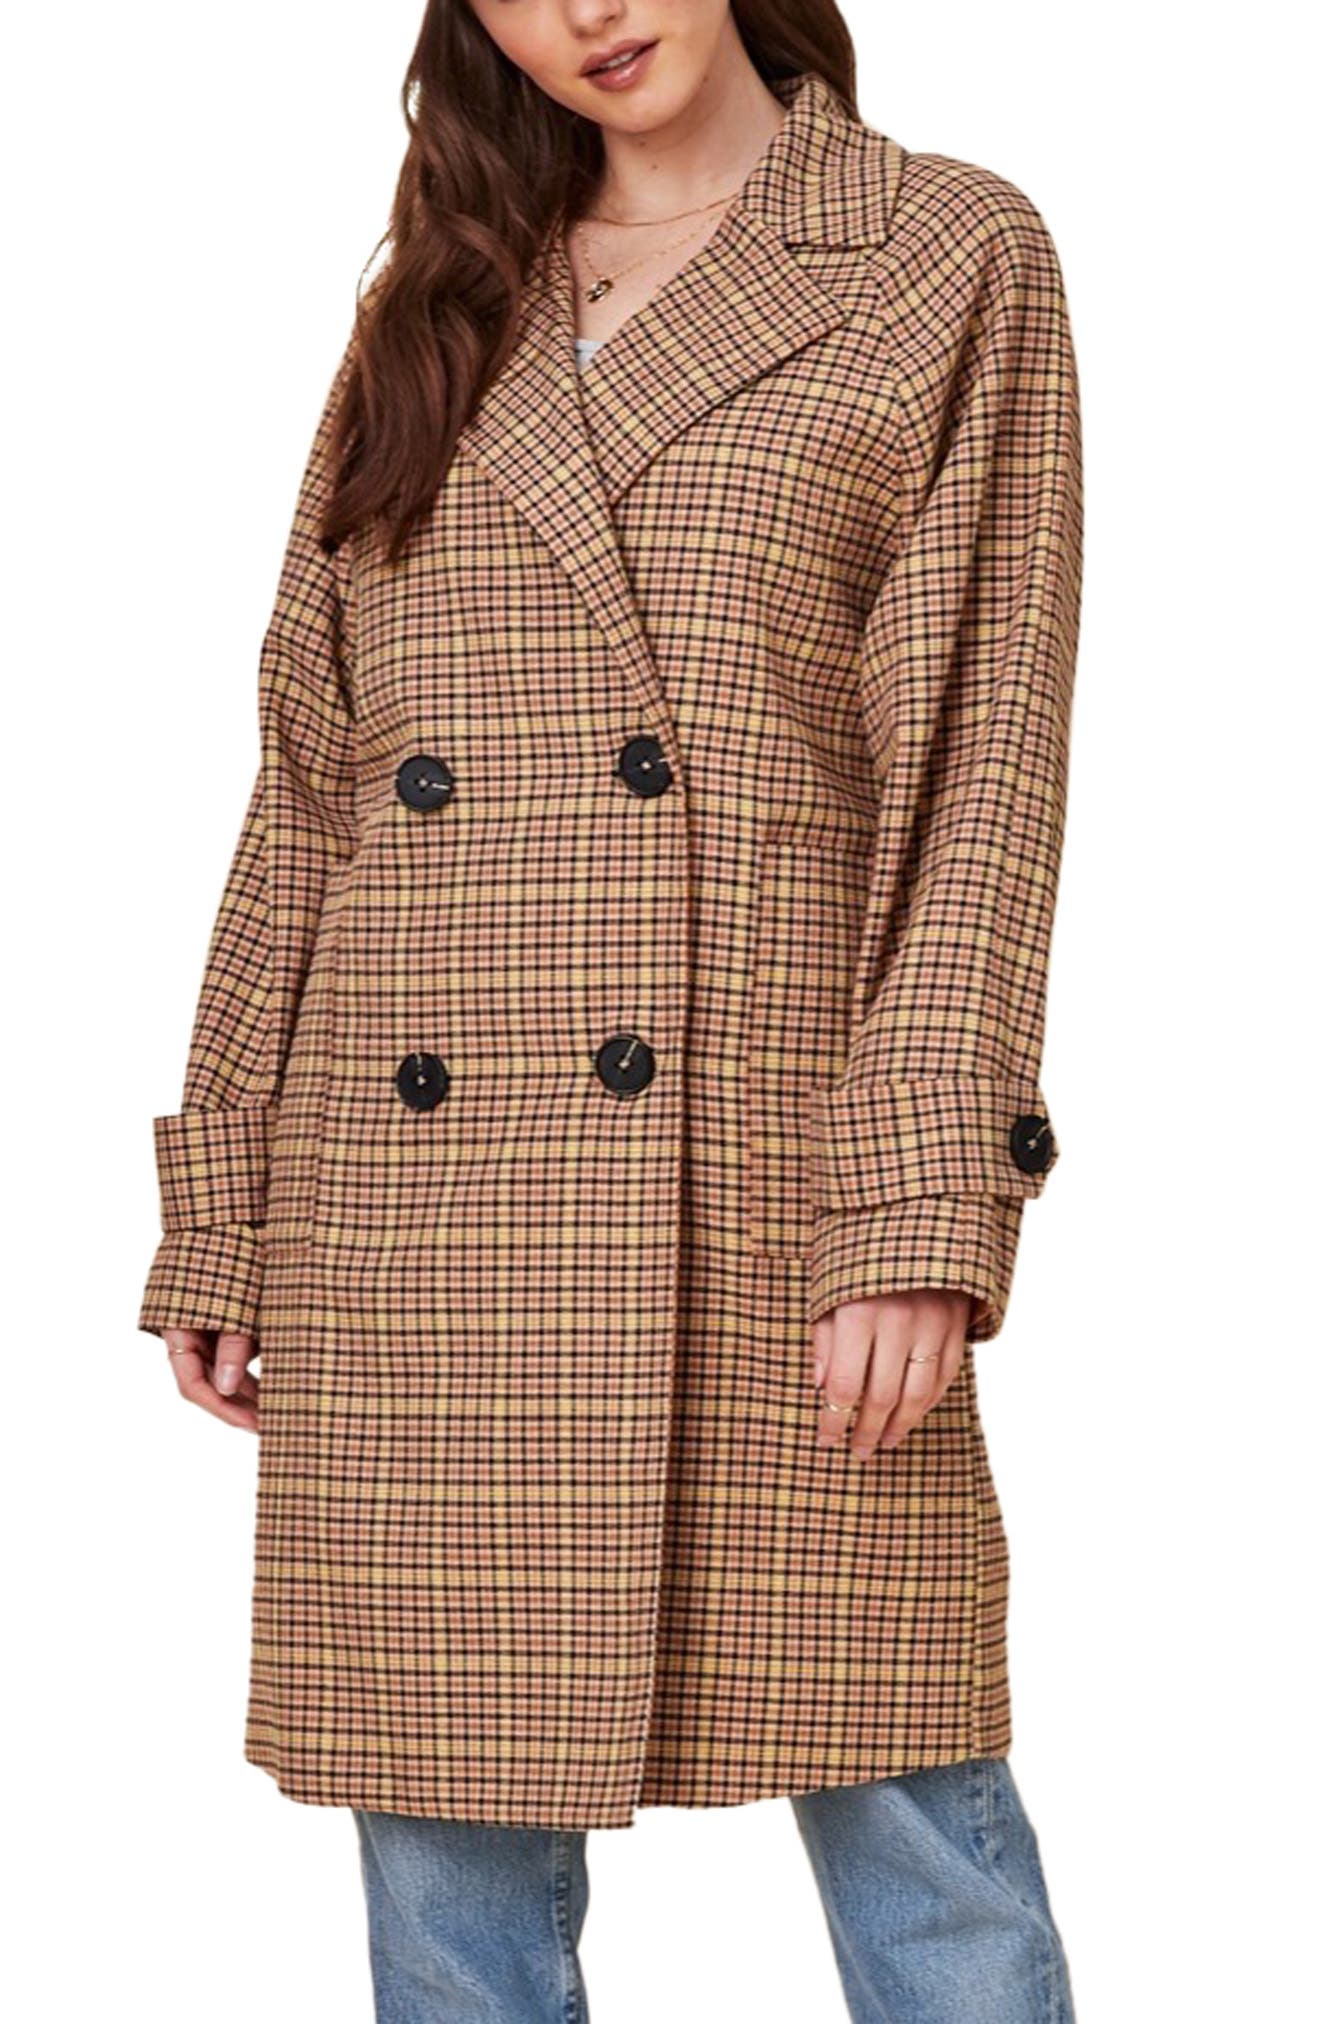 Vintage Coats & Jackets | Retro Coats and Jackets Womens Lost  Wander Tumbleweed Plaid Double Breasted Jacket $120.00 AT vintagedancer.com